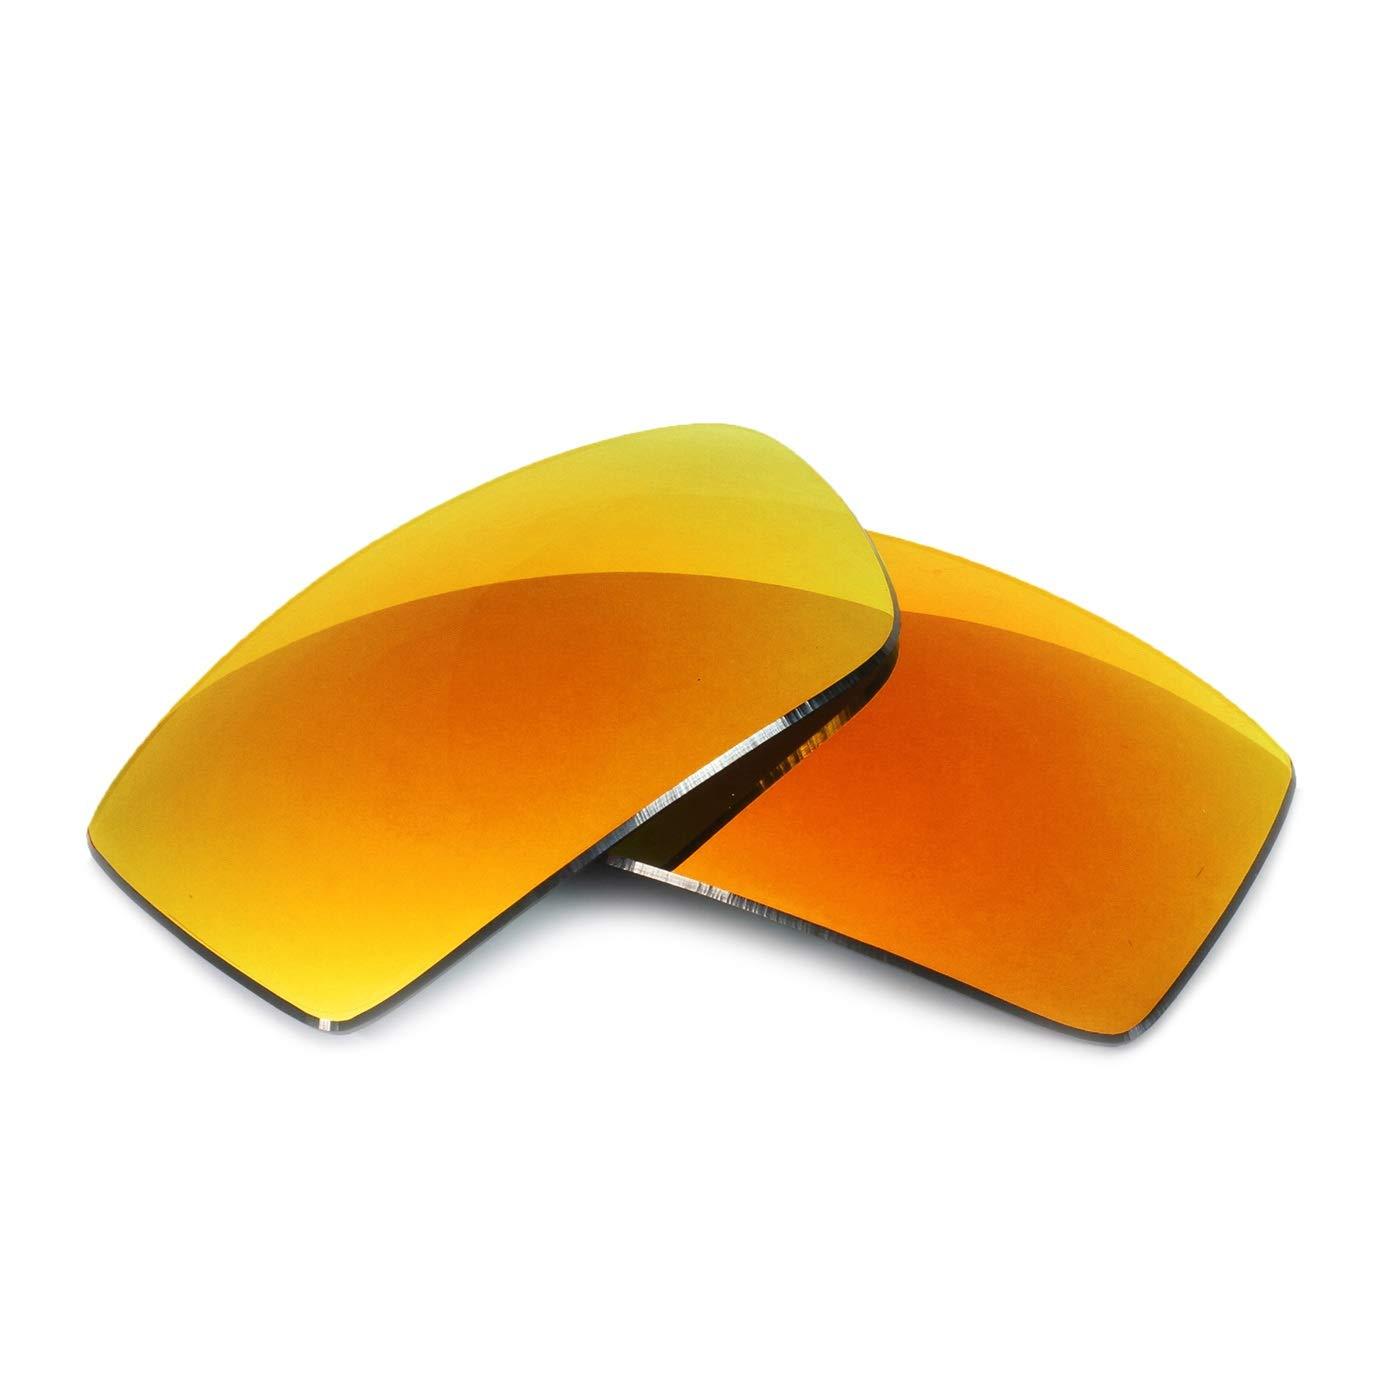 Fuse Lenses Polarized Replacement Lenses for Under Armour Ranger